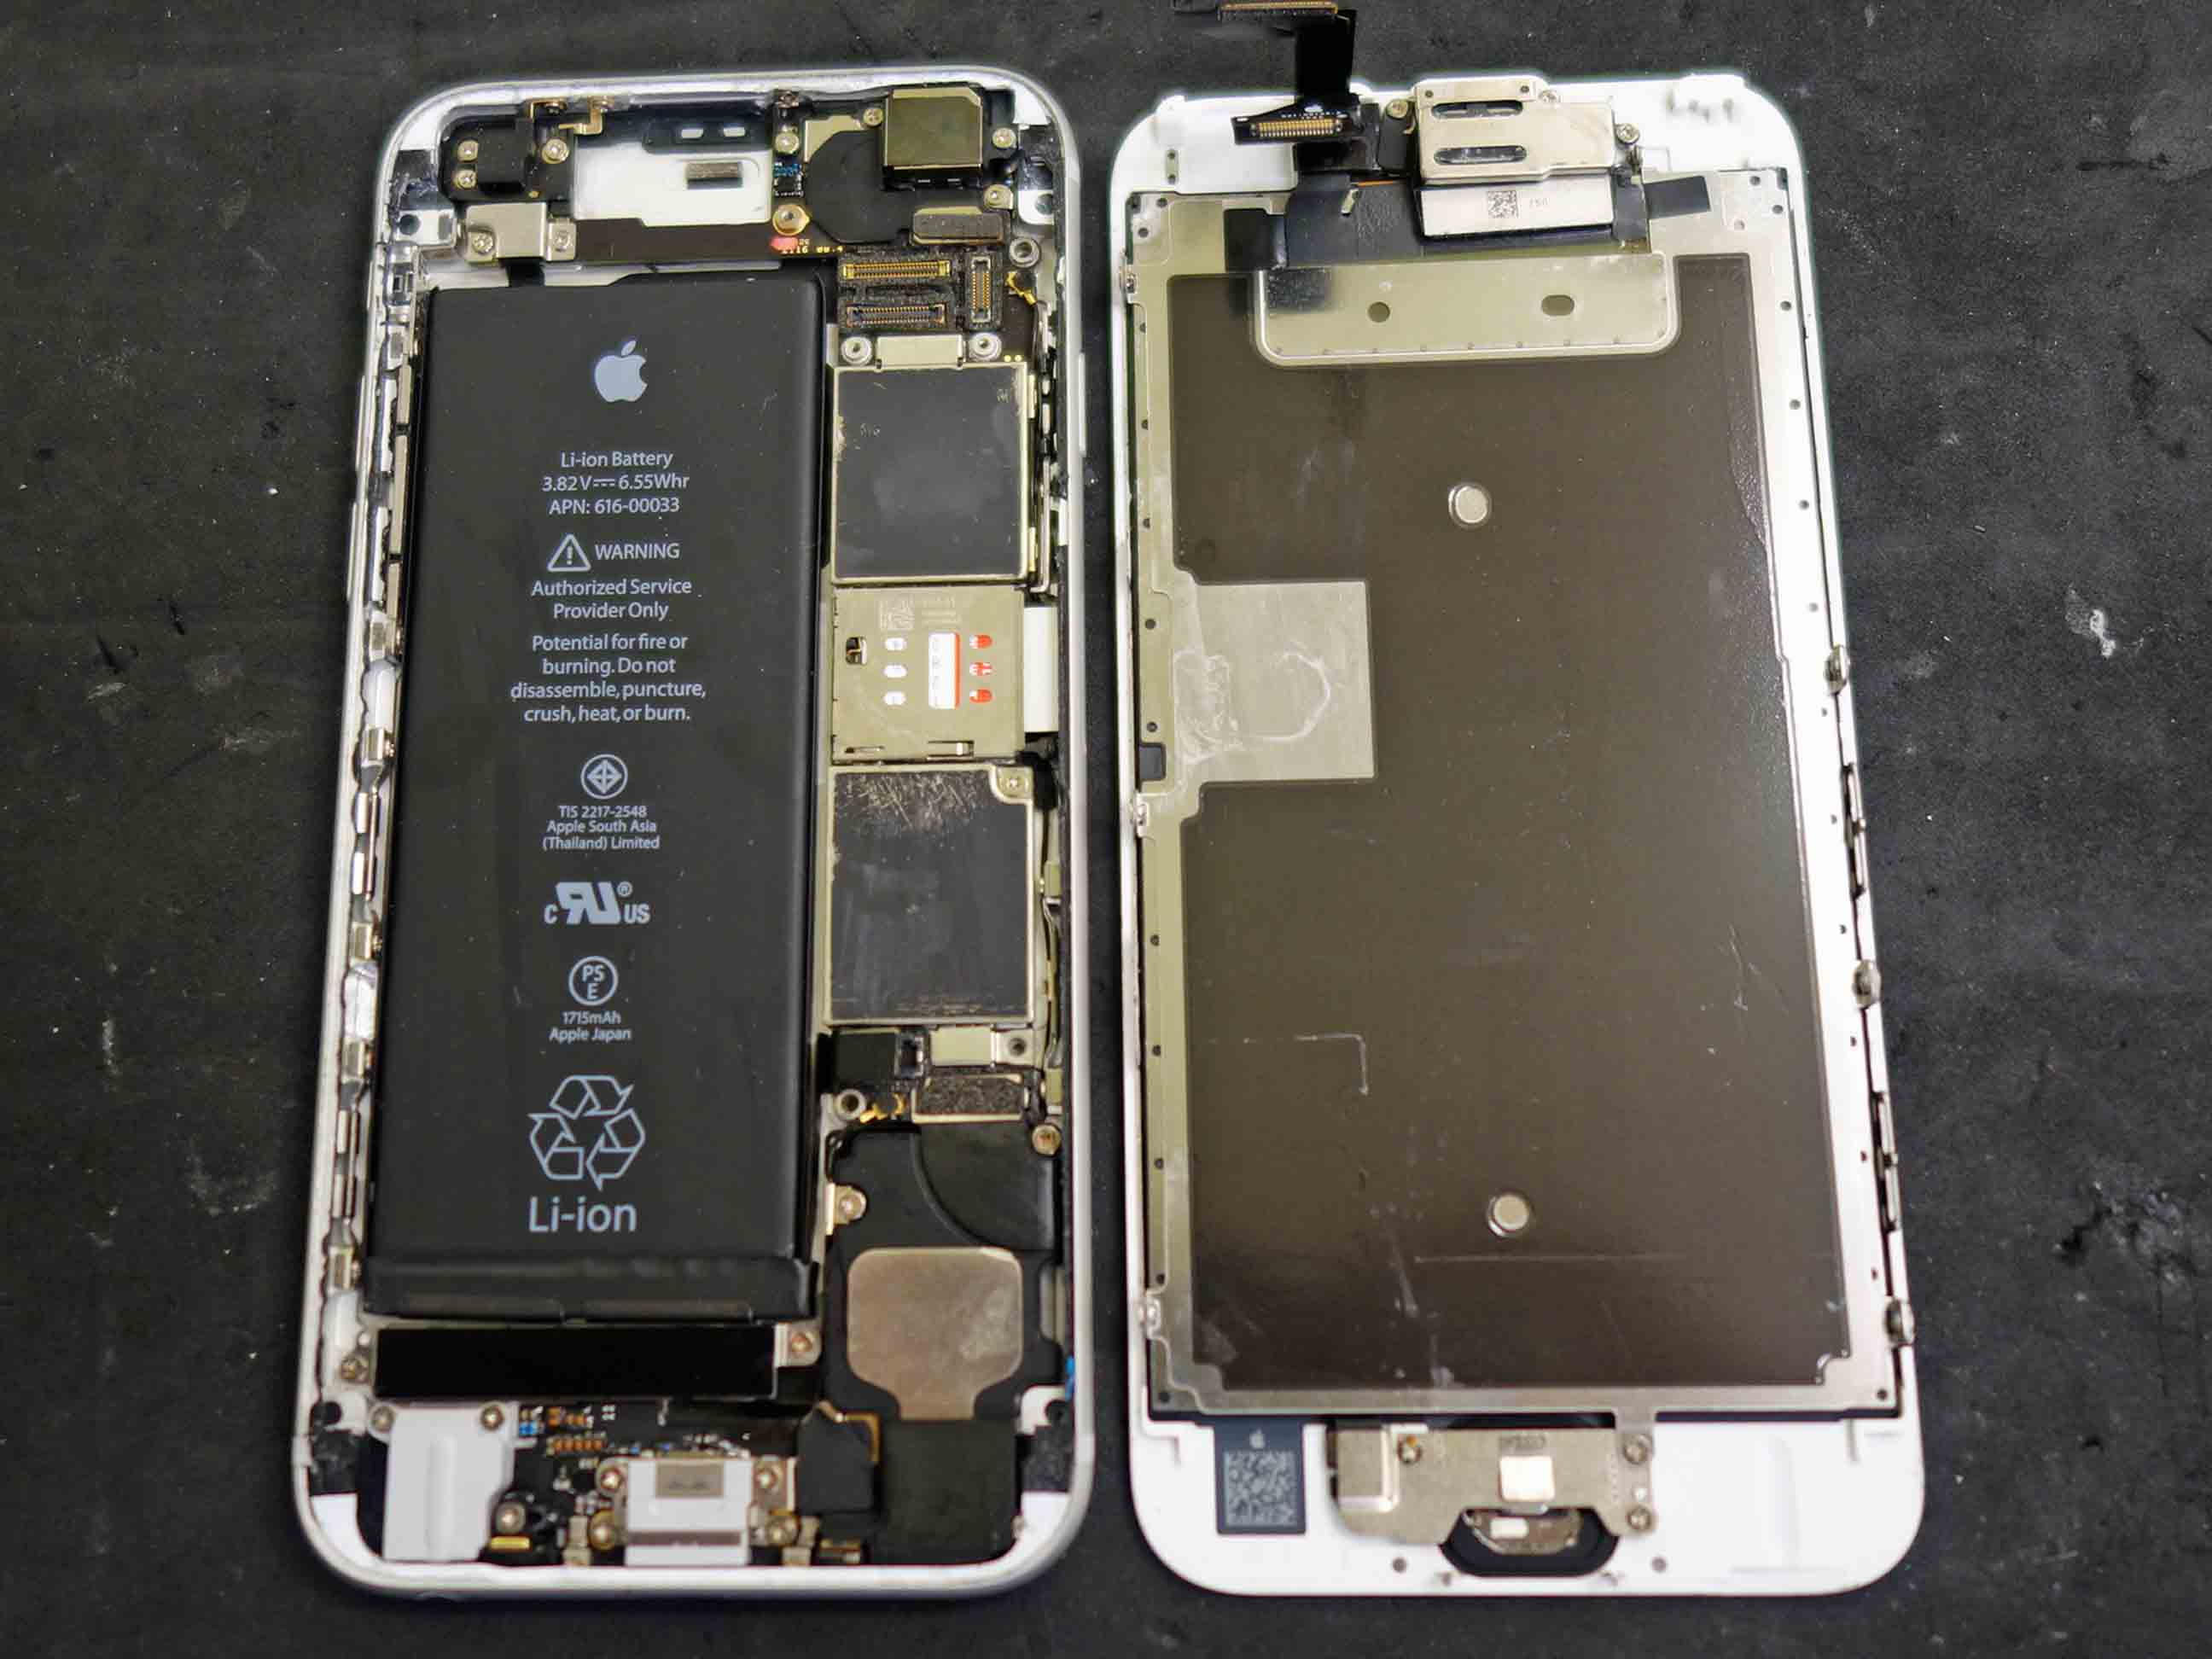 iPhone6Sの水没データ復旧 基盤修理に名古屋市内からご来店!アイフォン修理のクイック名古屋